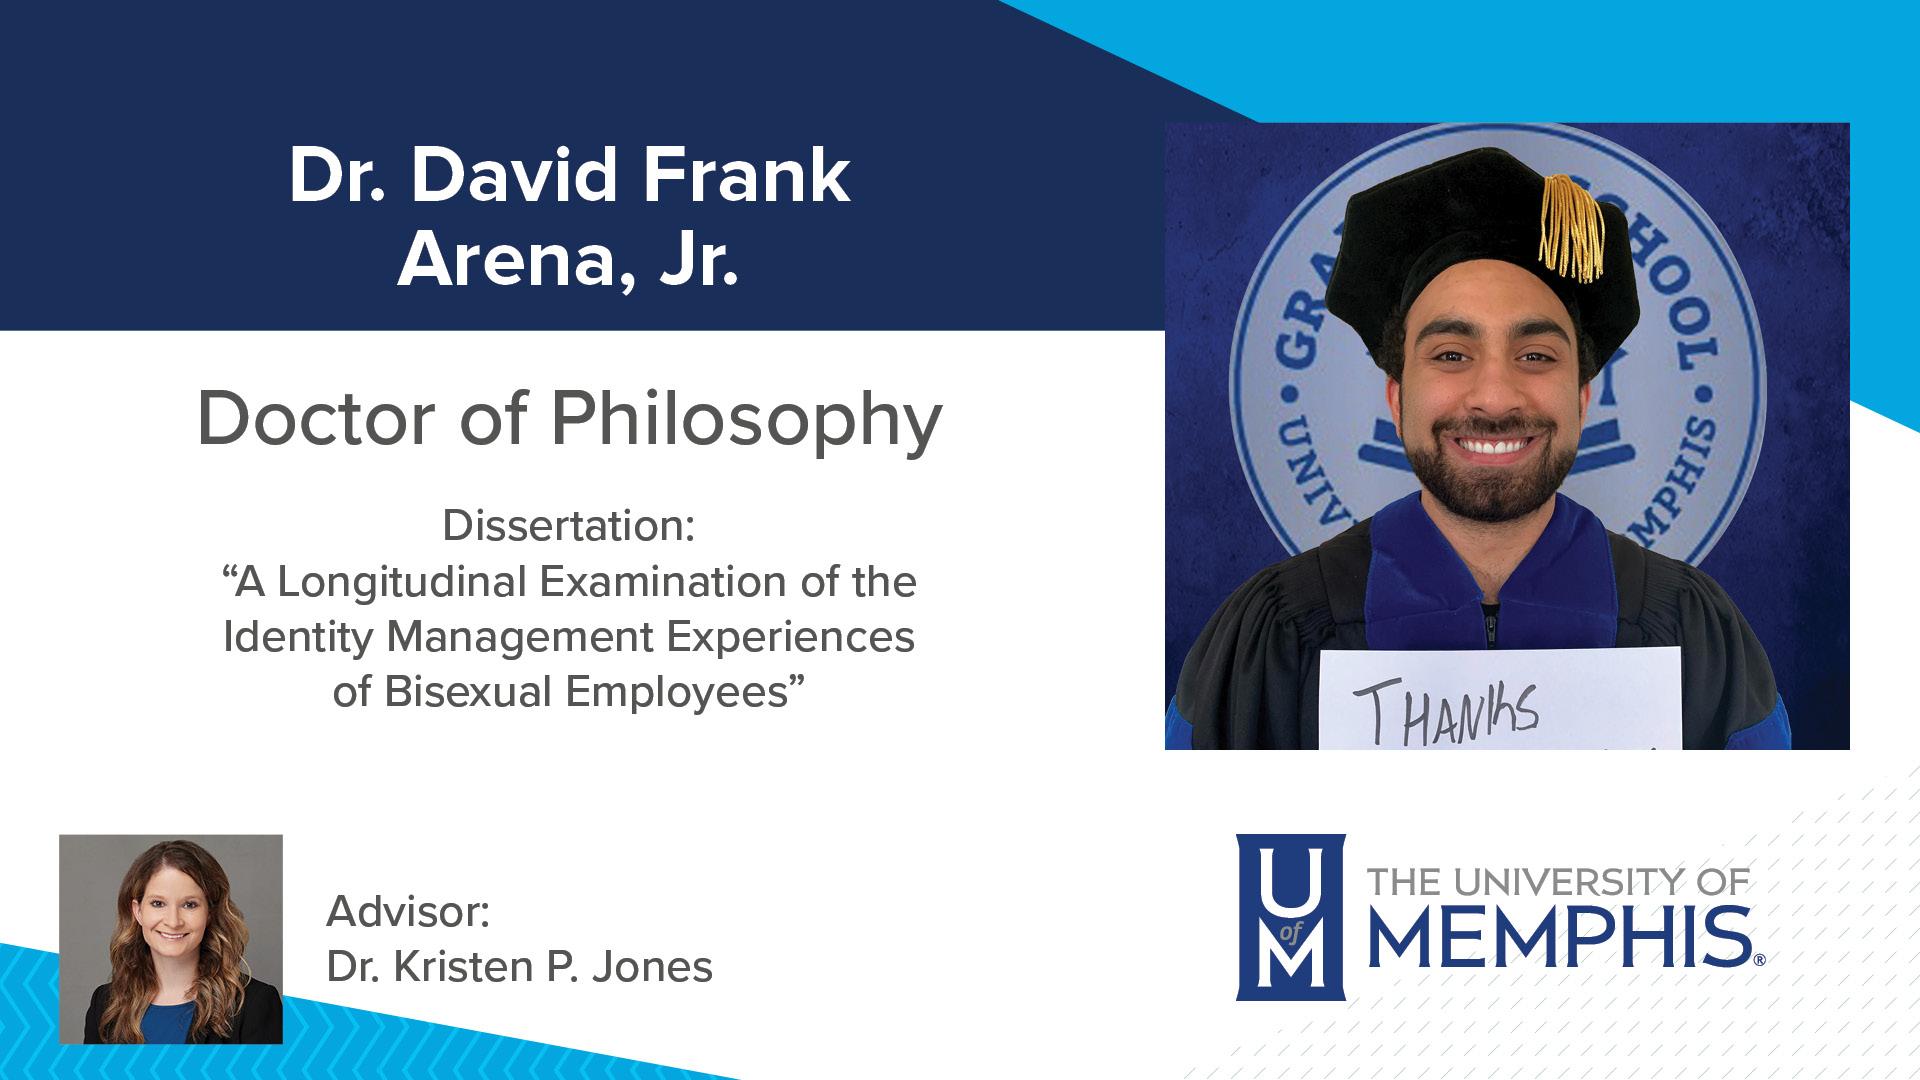 "Dr. David Frank Arena, Jr. Dissertation: ""A Longitudinal Examination of the Identity Management Experiences of Bisexual Employees"" Major Professor: Dr. Kristen P Jones"